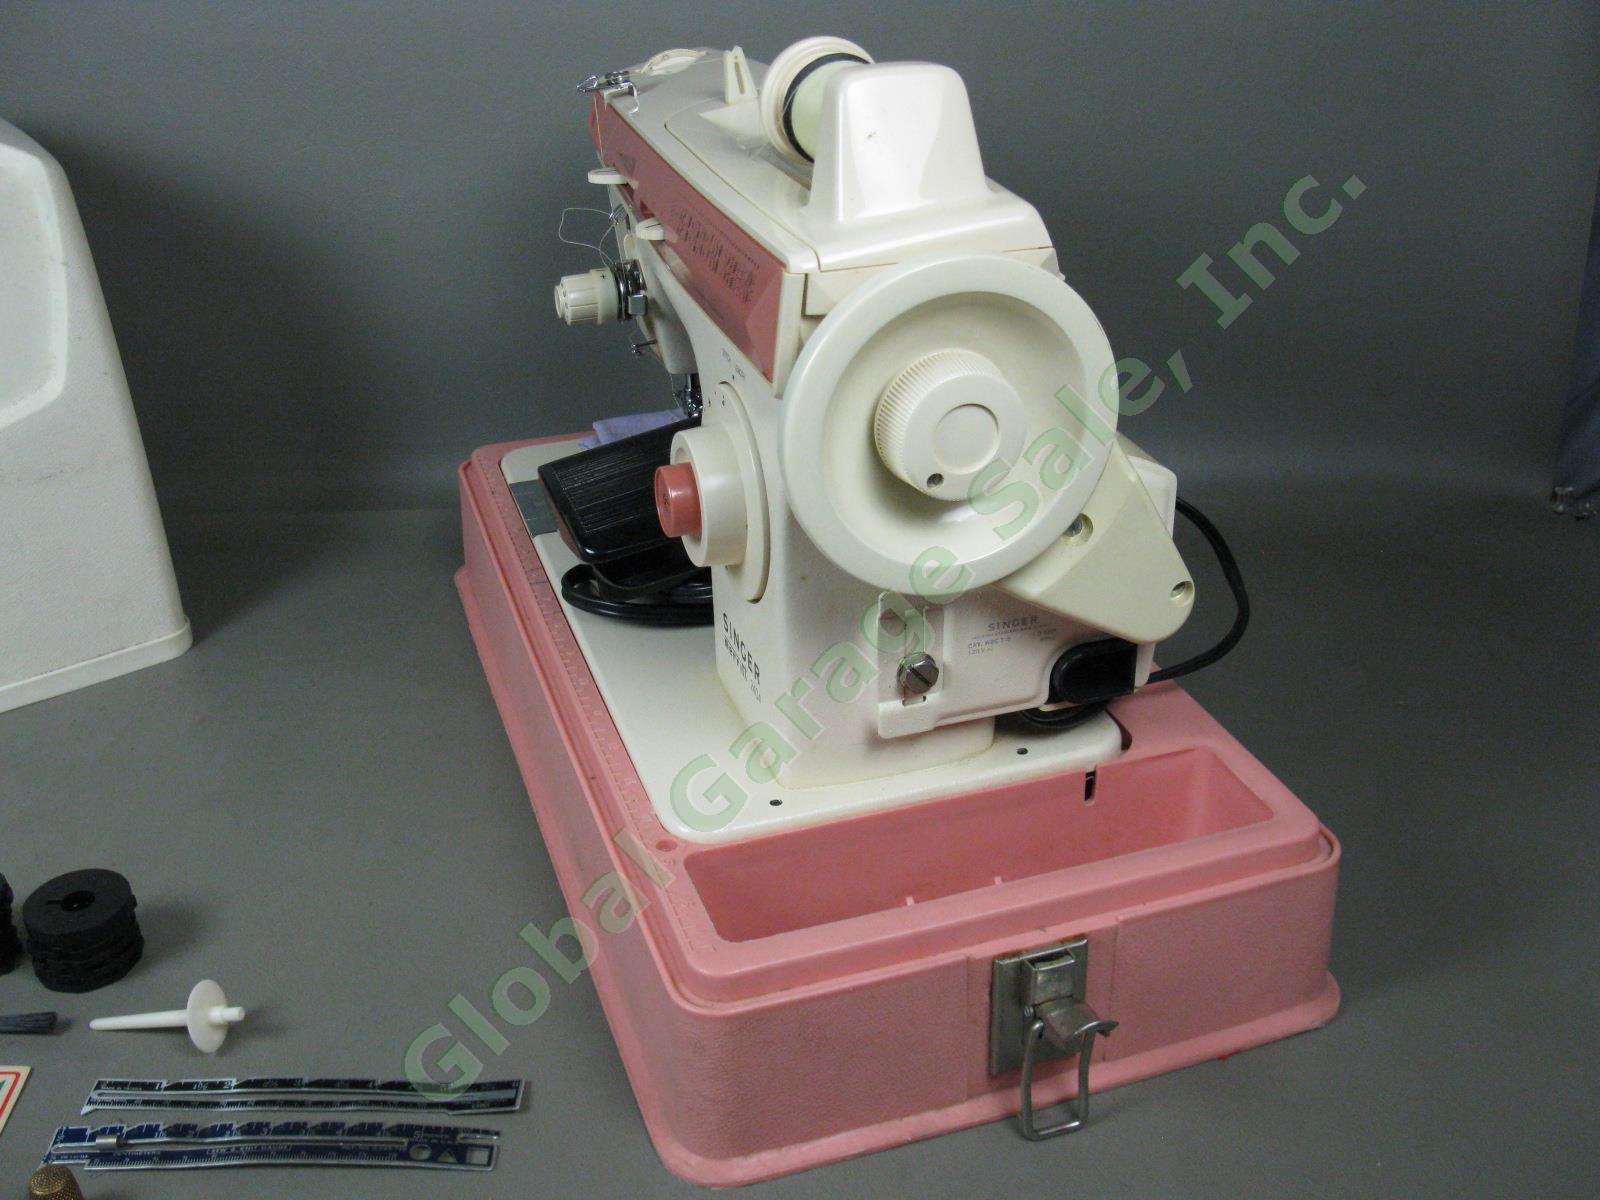 singer merritt 2404 sewing machine